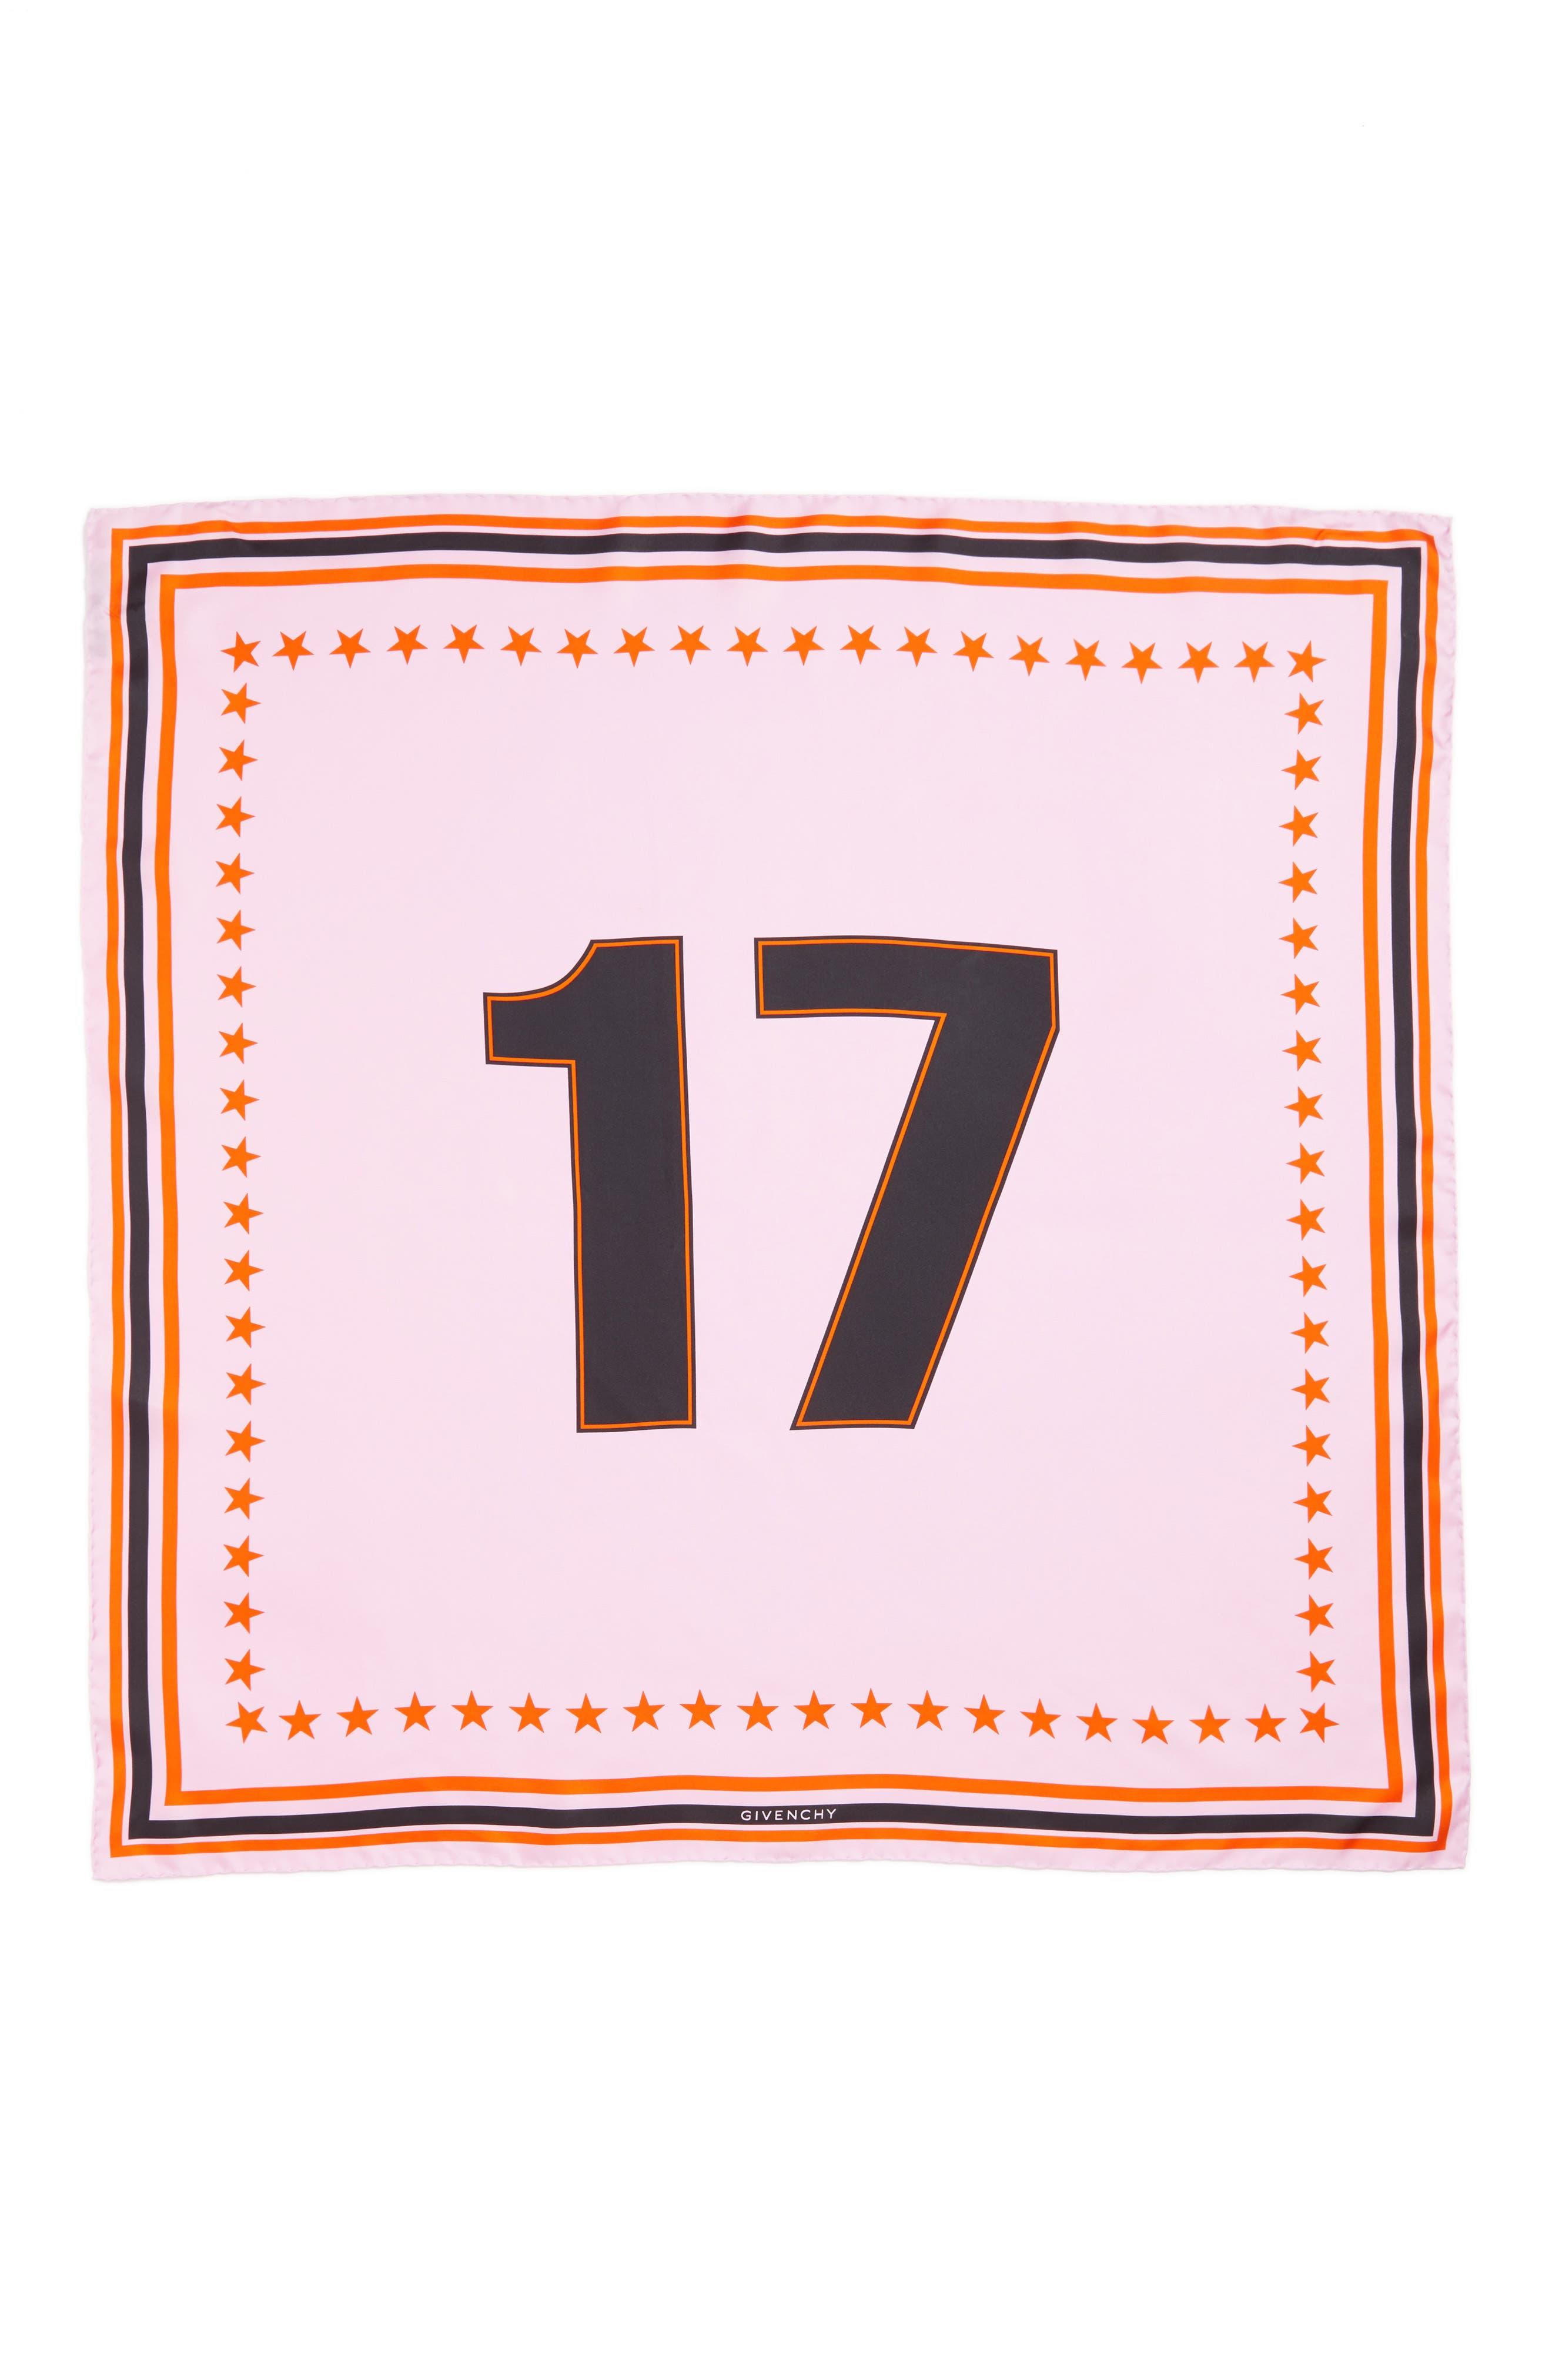 Main Image - Givenchy '17' Square Silk Scarf